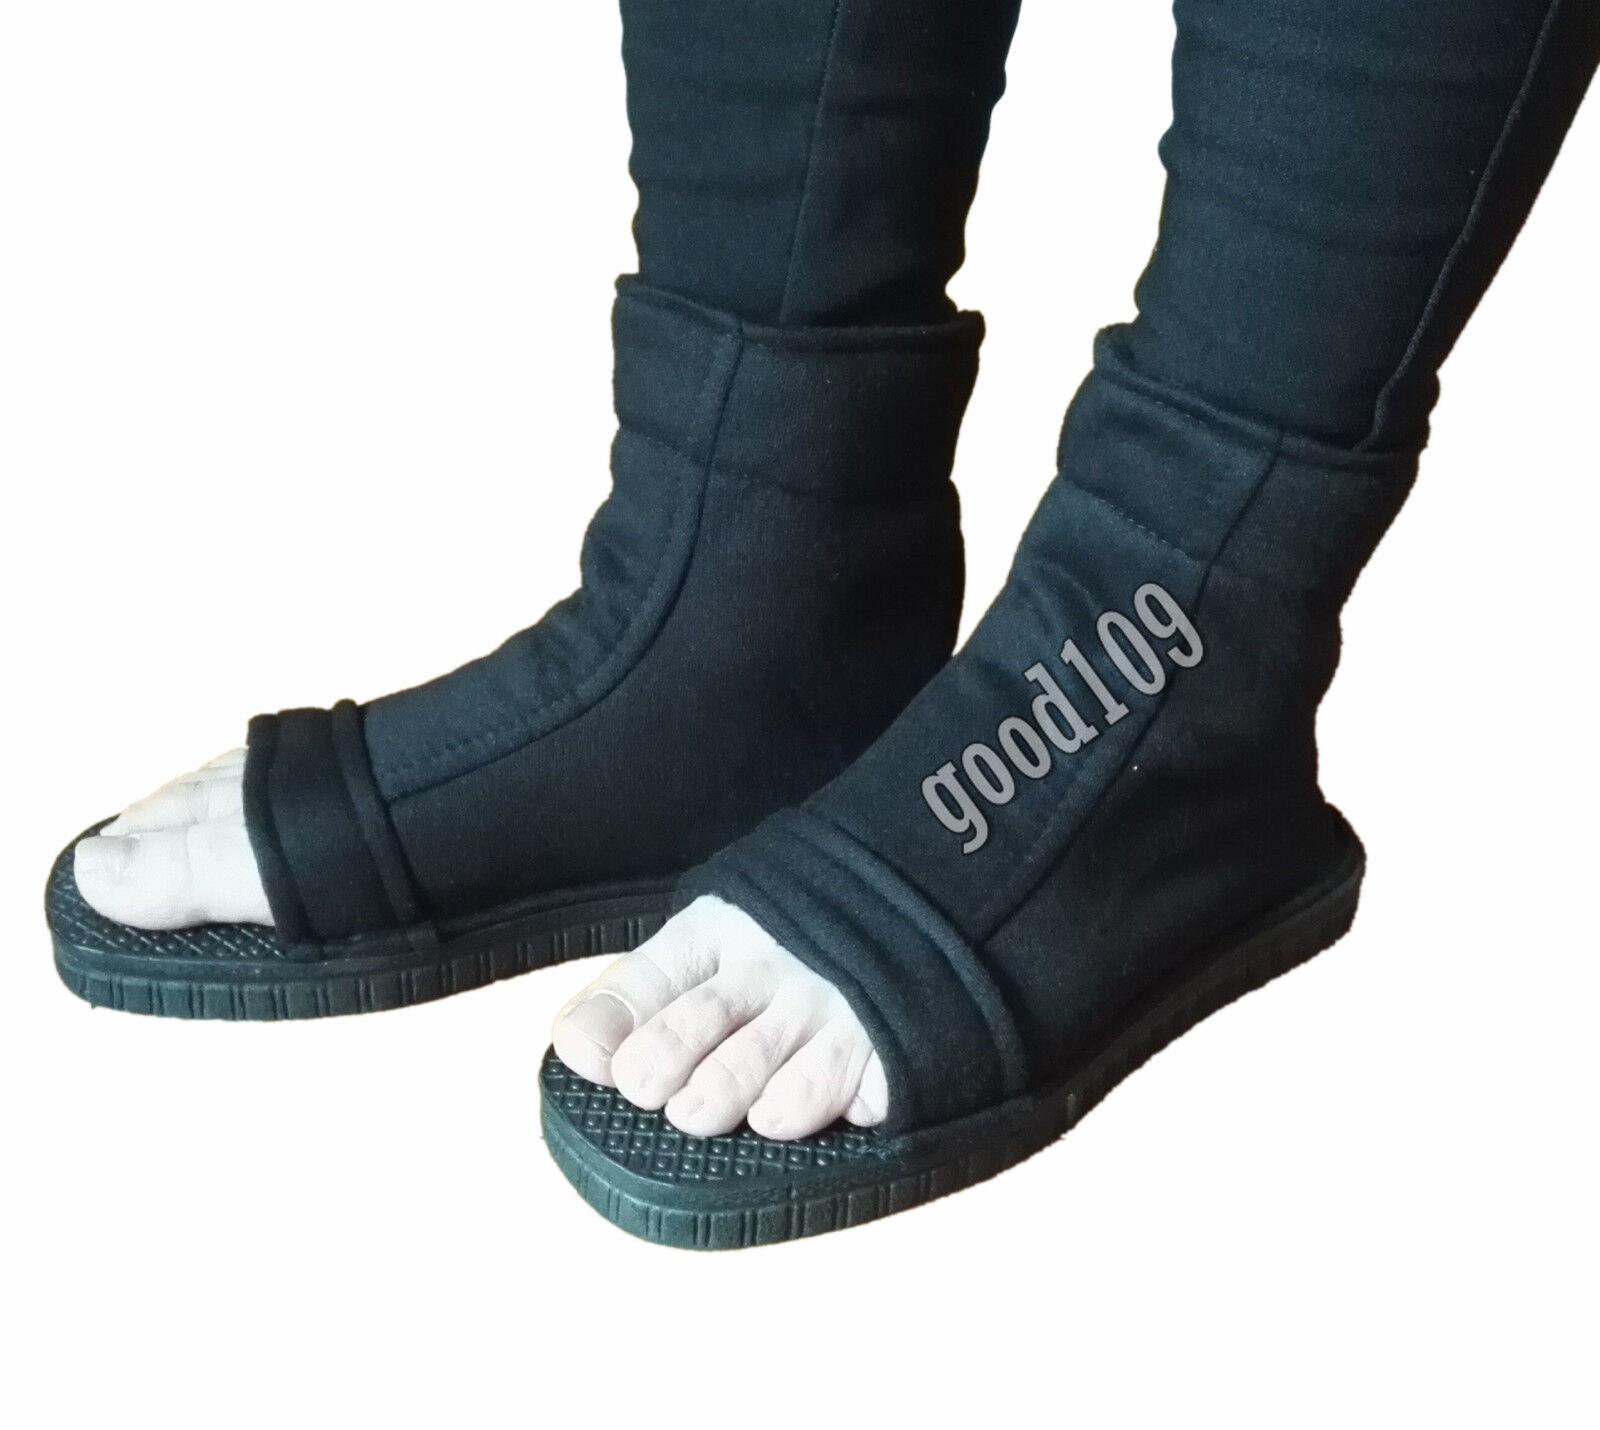 Cafiona NARUTO Uchiha Sasuke Cosplay Shoes Black Ninja Version Boots Halloween